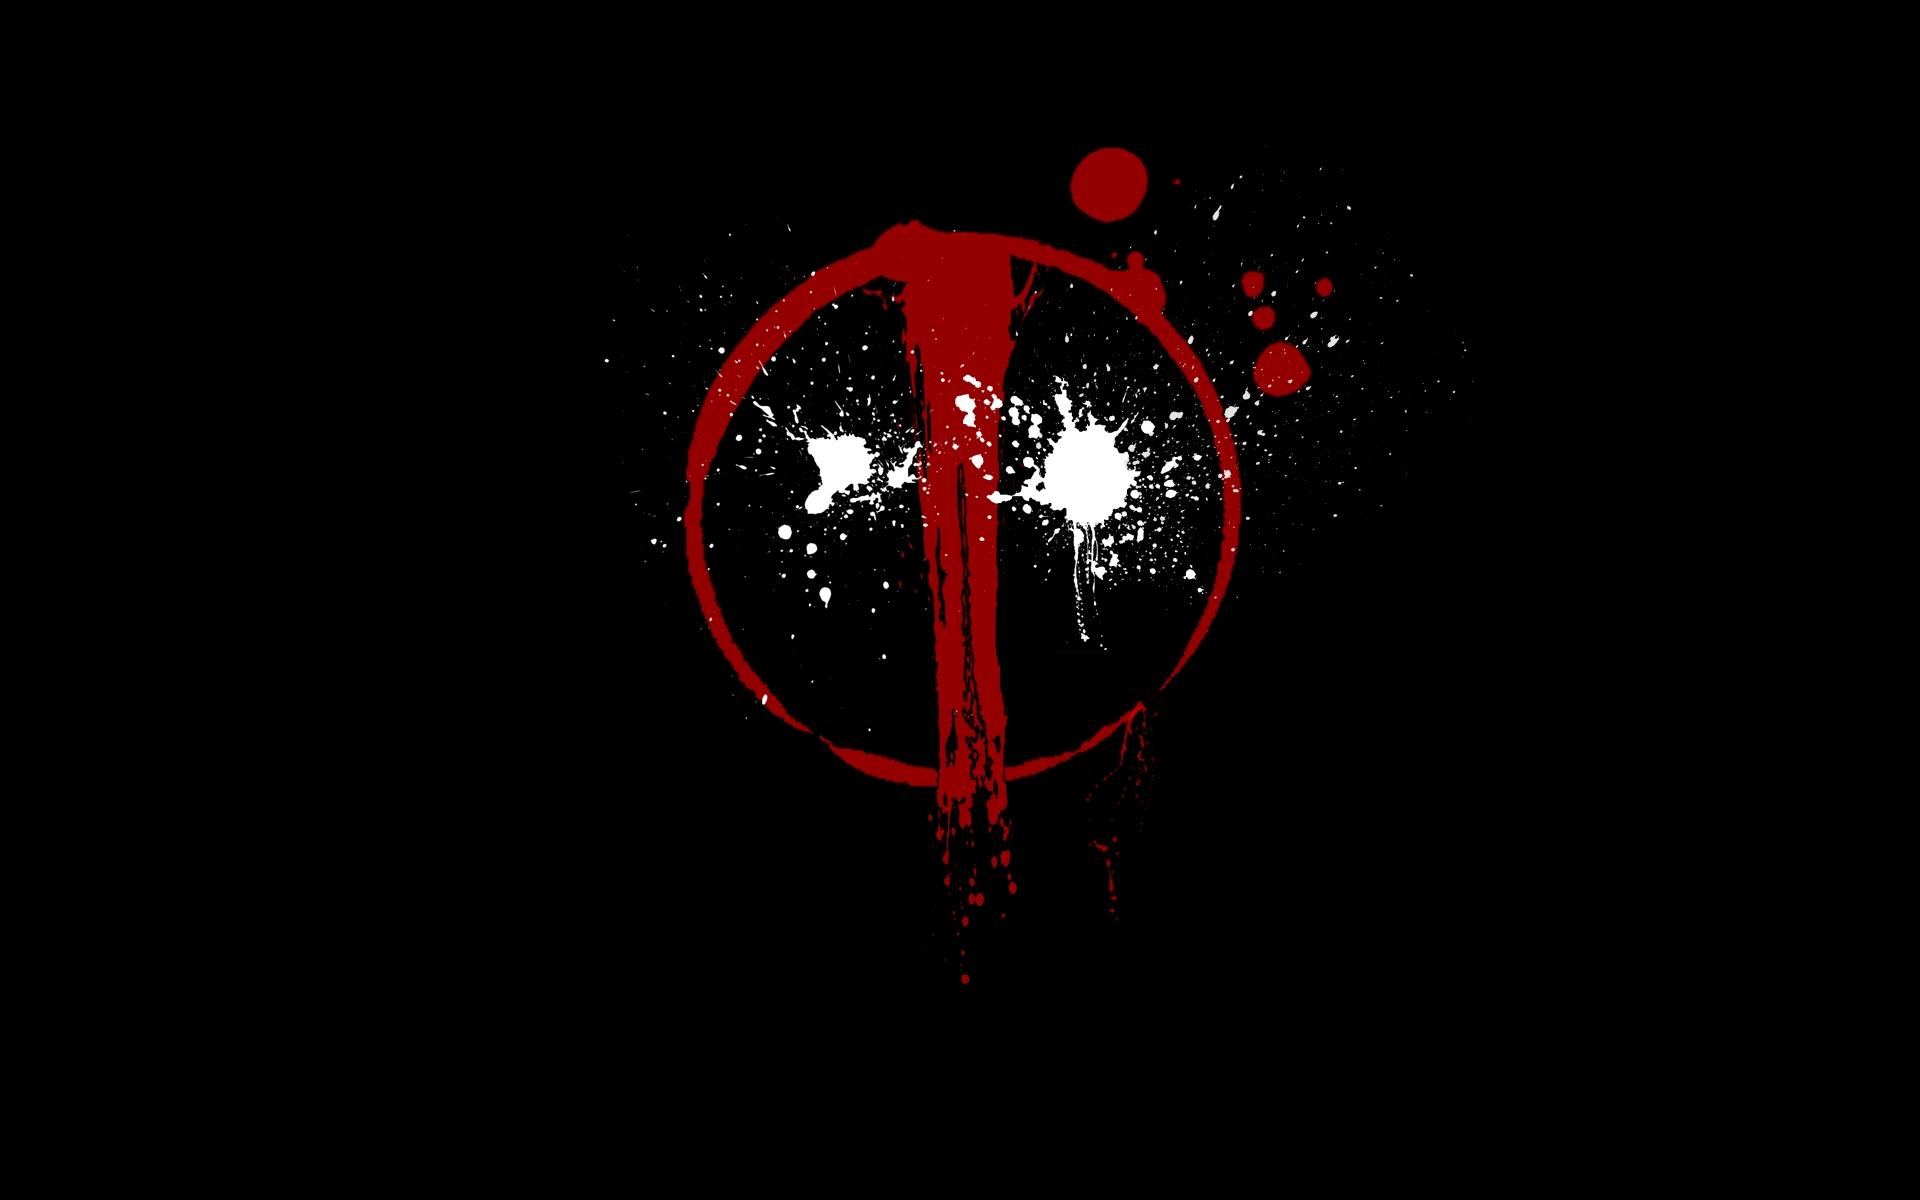 reb-black-deadpool-logo-wallpapers-hd - wallpaper.wiki